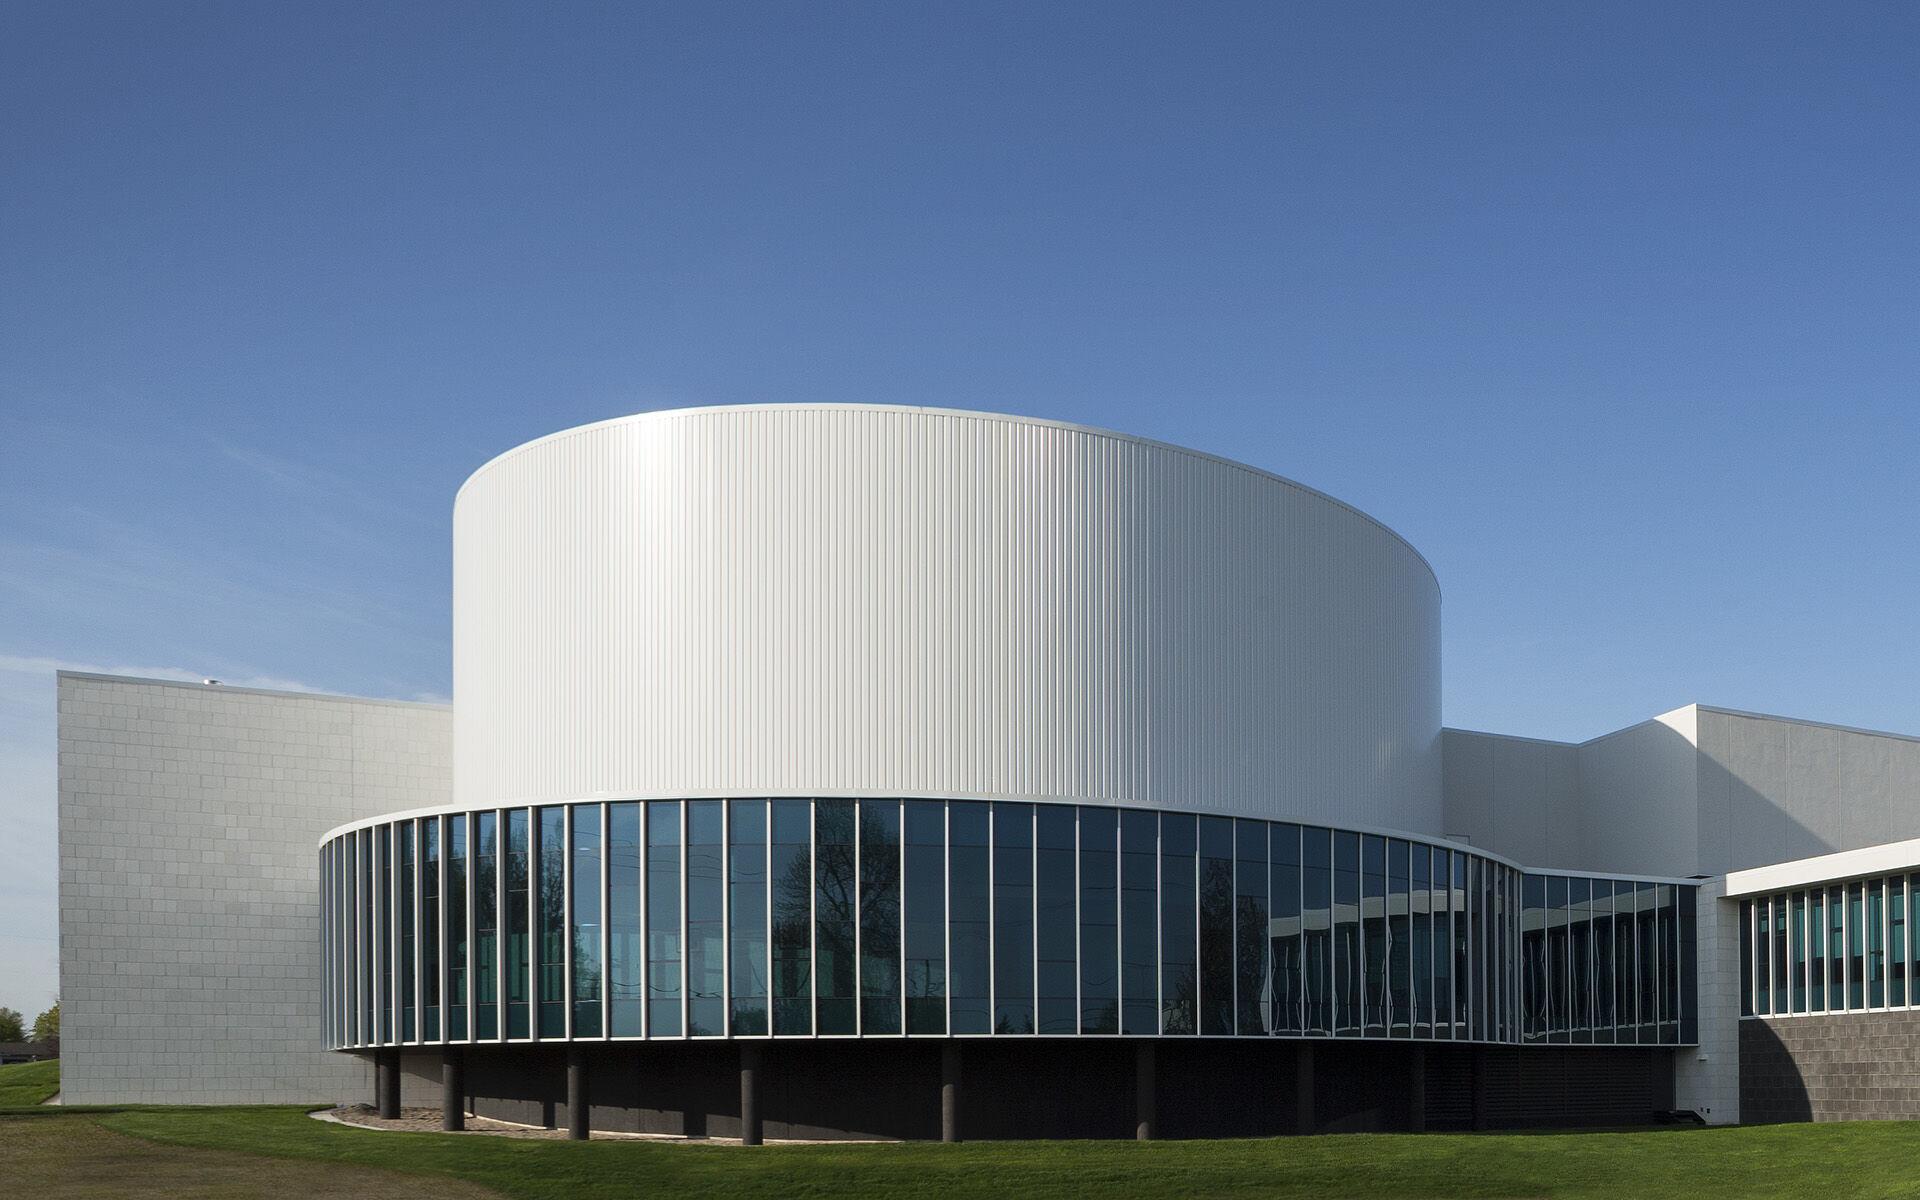 Jenison Performing Arts Center Auditorium - Jenison Public Schools